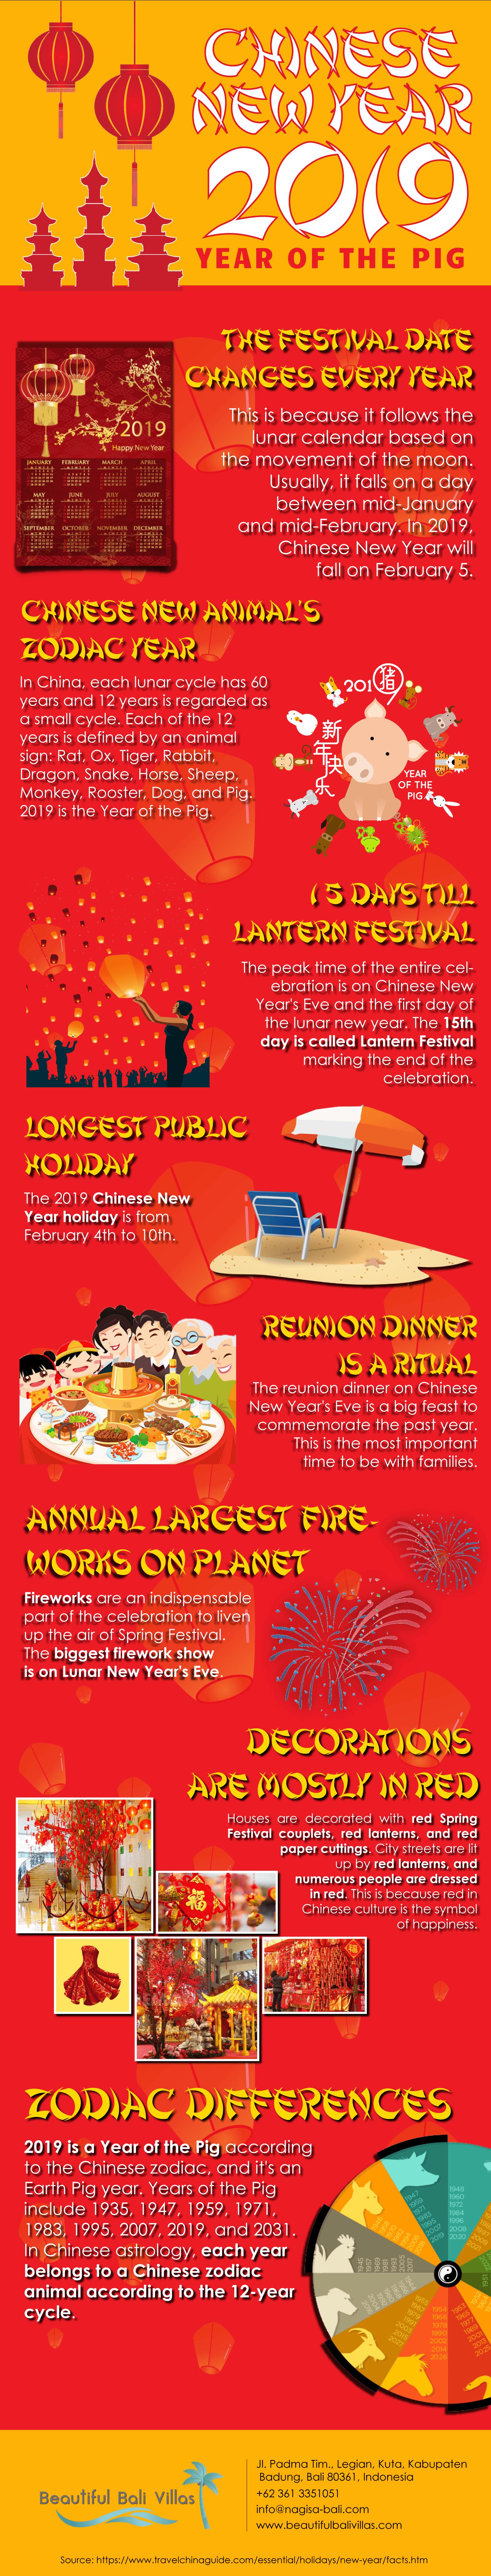 Chinese New Year 2019 [INFOGRAPHIC]